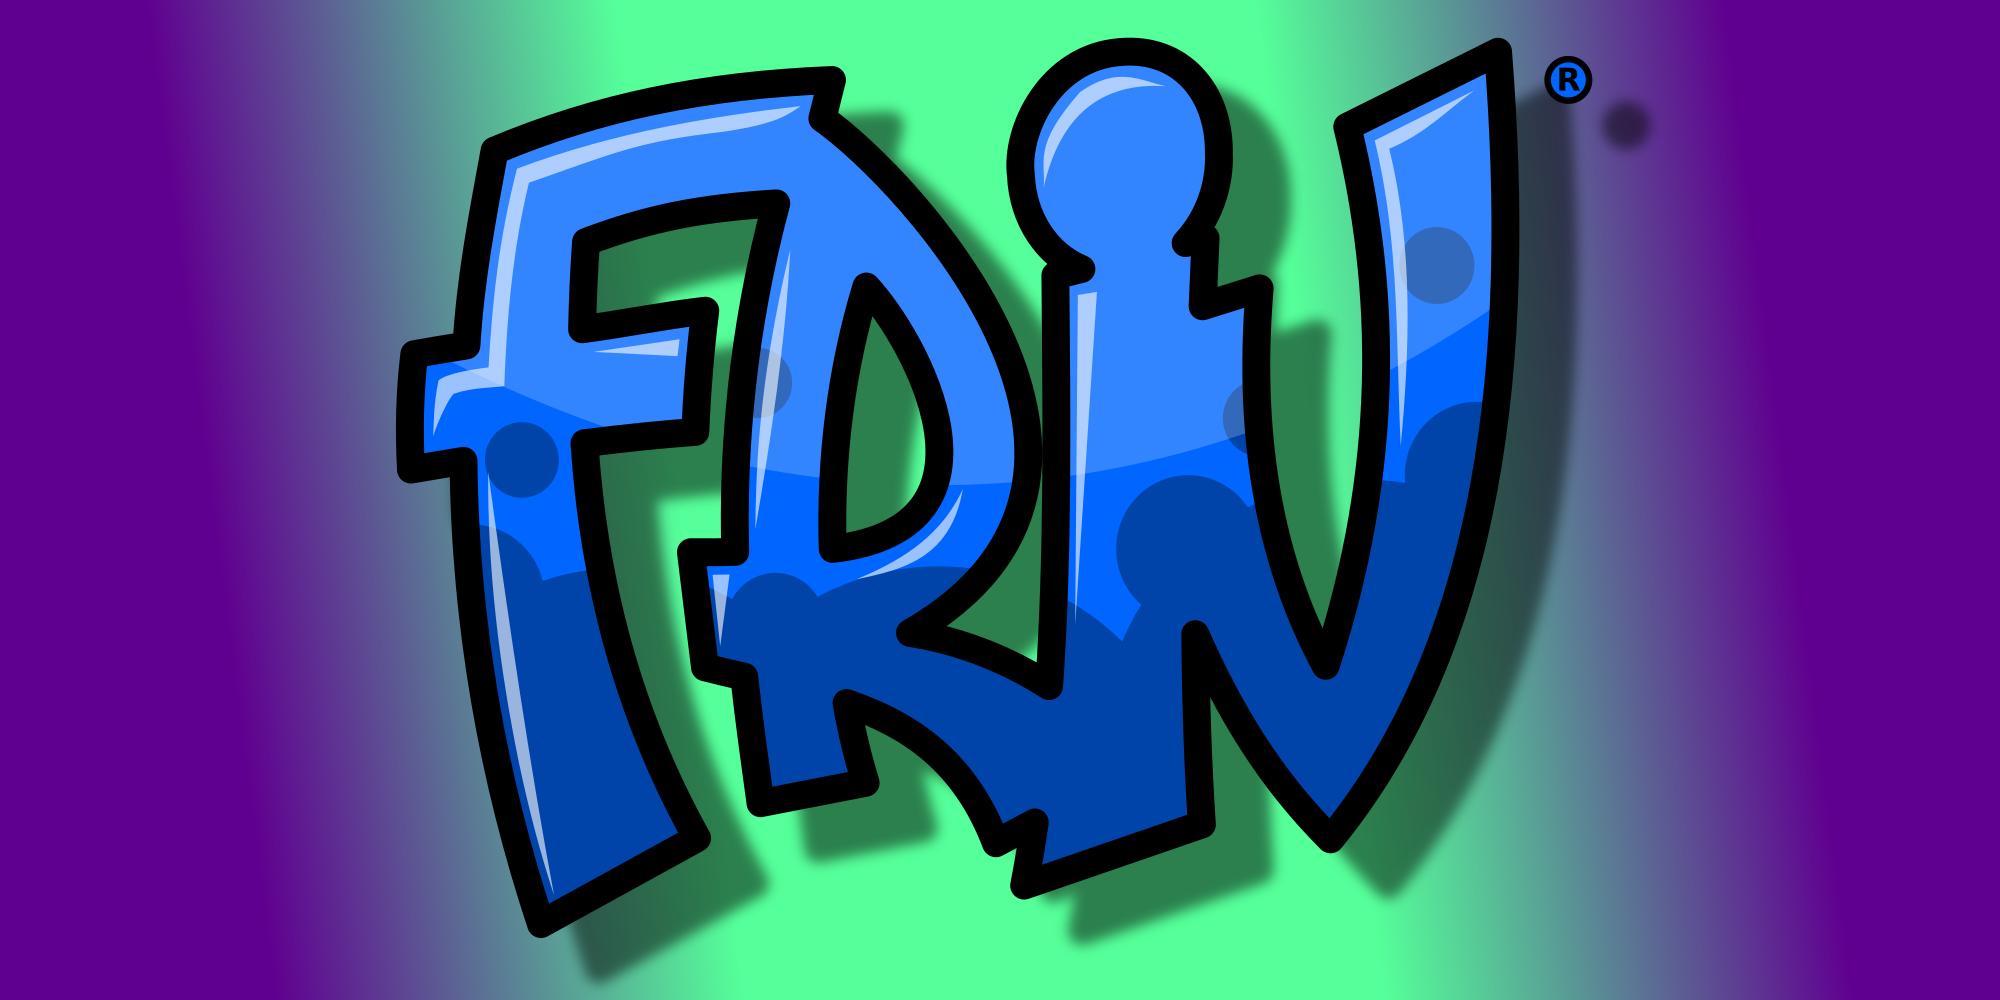 FRIV COM : The Best Free Online Games! [Jogos | Juegos]